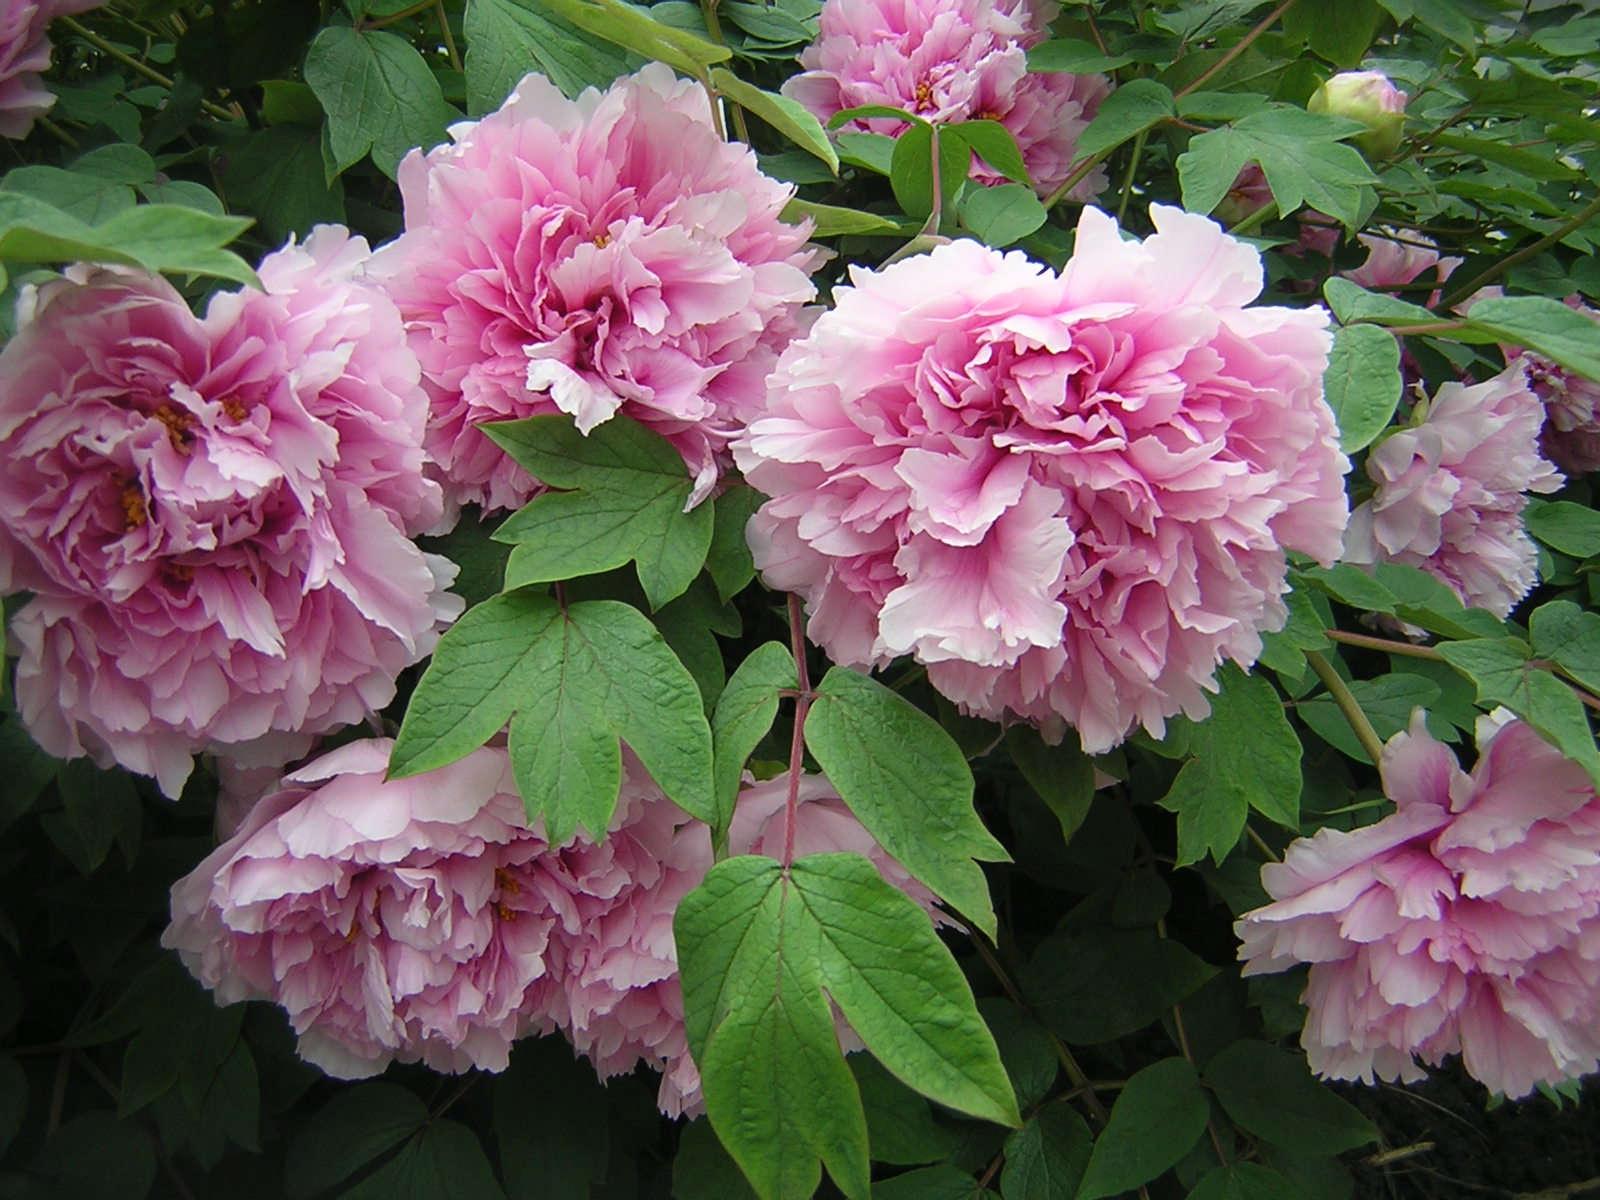 pink-peony-flower-56.jpg